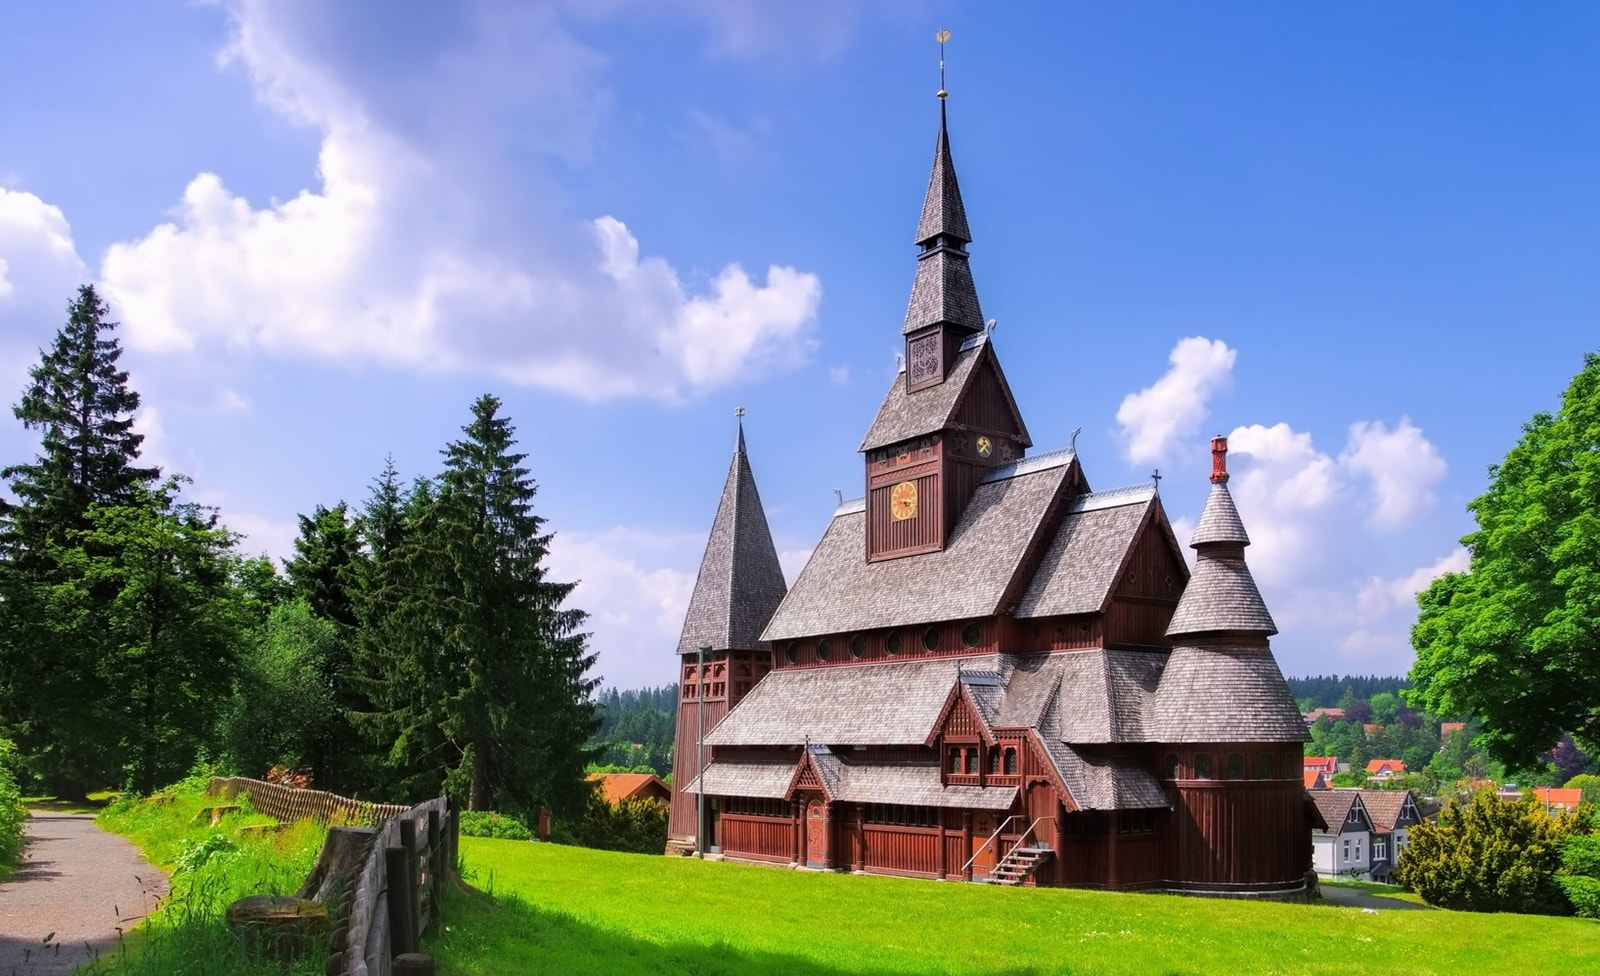 Stabkirche in Goslar